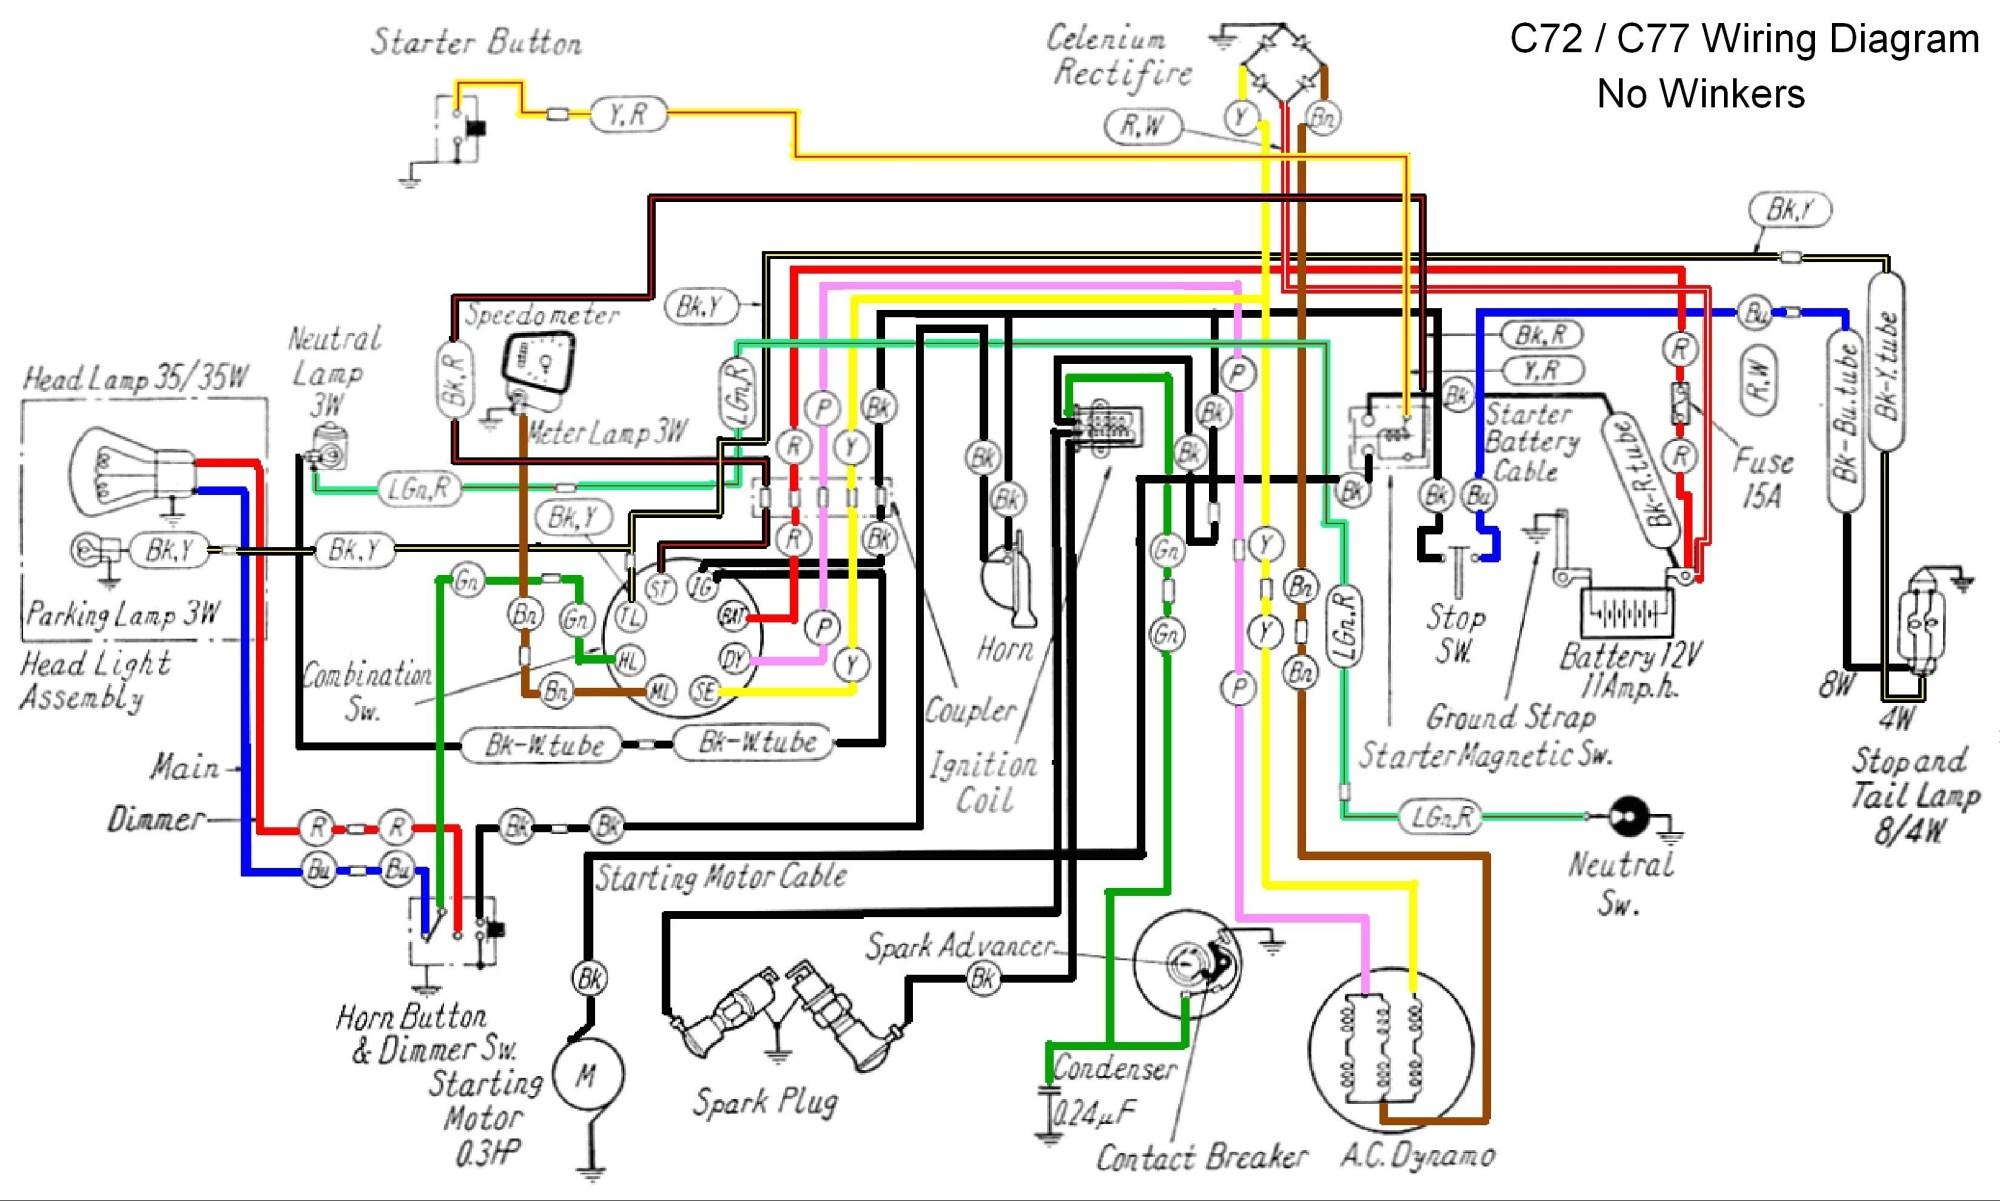 hight resolution of wiring diagram for honda 550 motorcycle wiring diagram centre cb550 wiring diagram wiring diagram wiring diagram